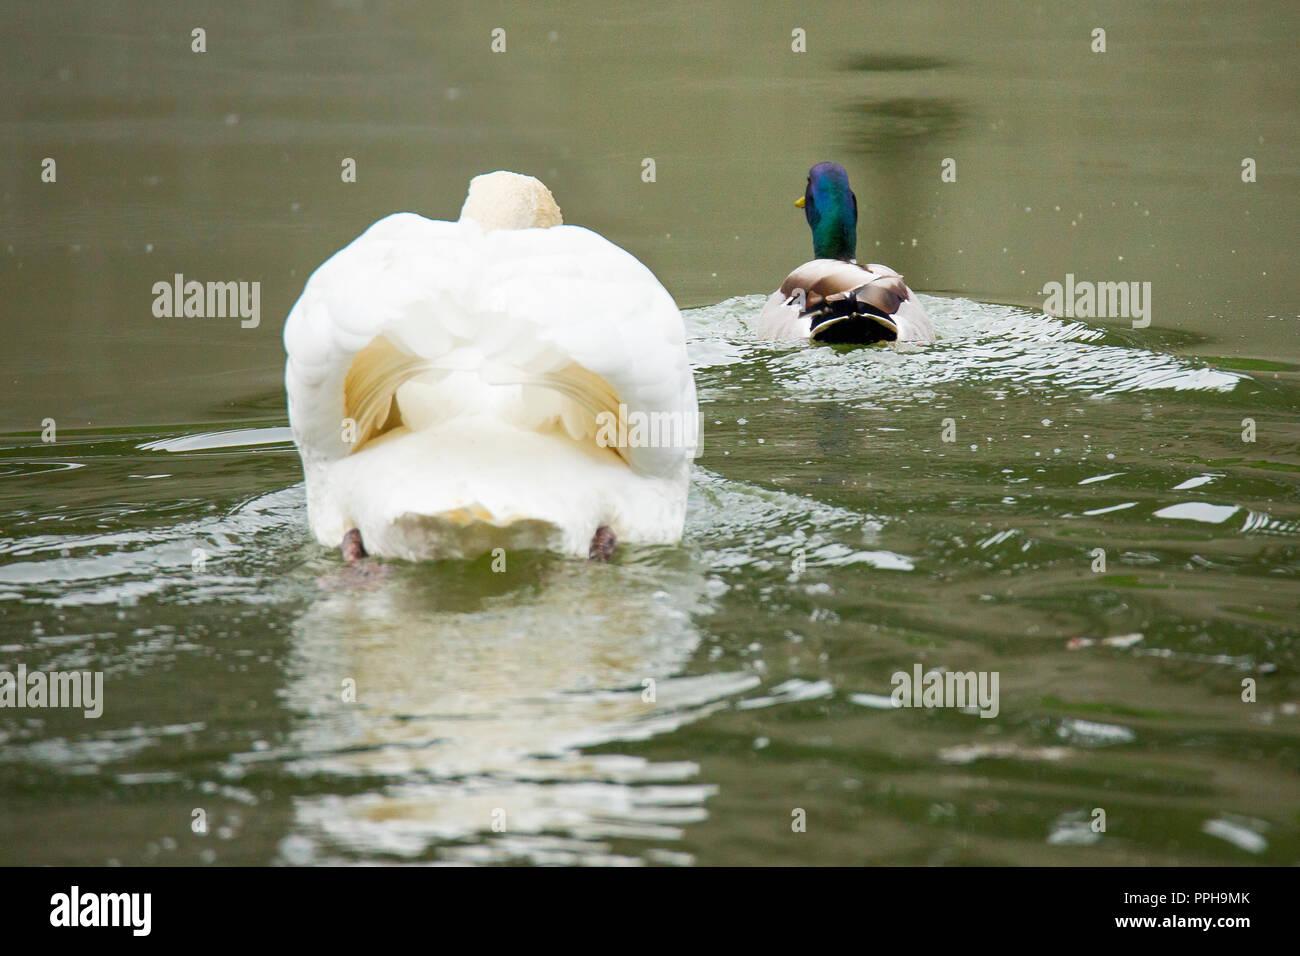 Swan hound duck - Stock Image